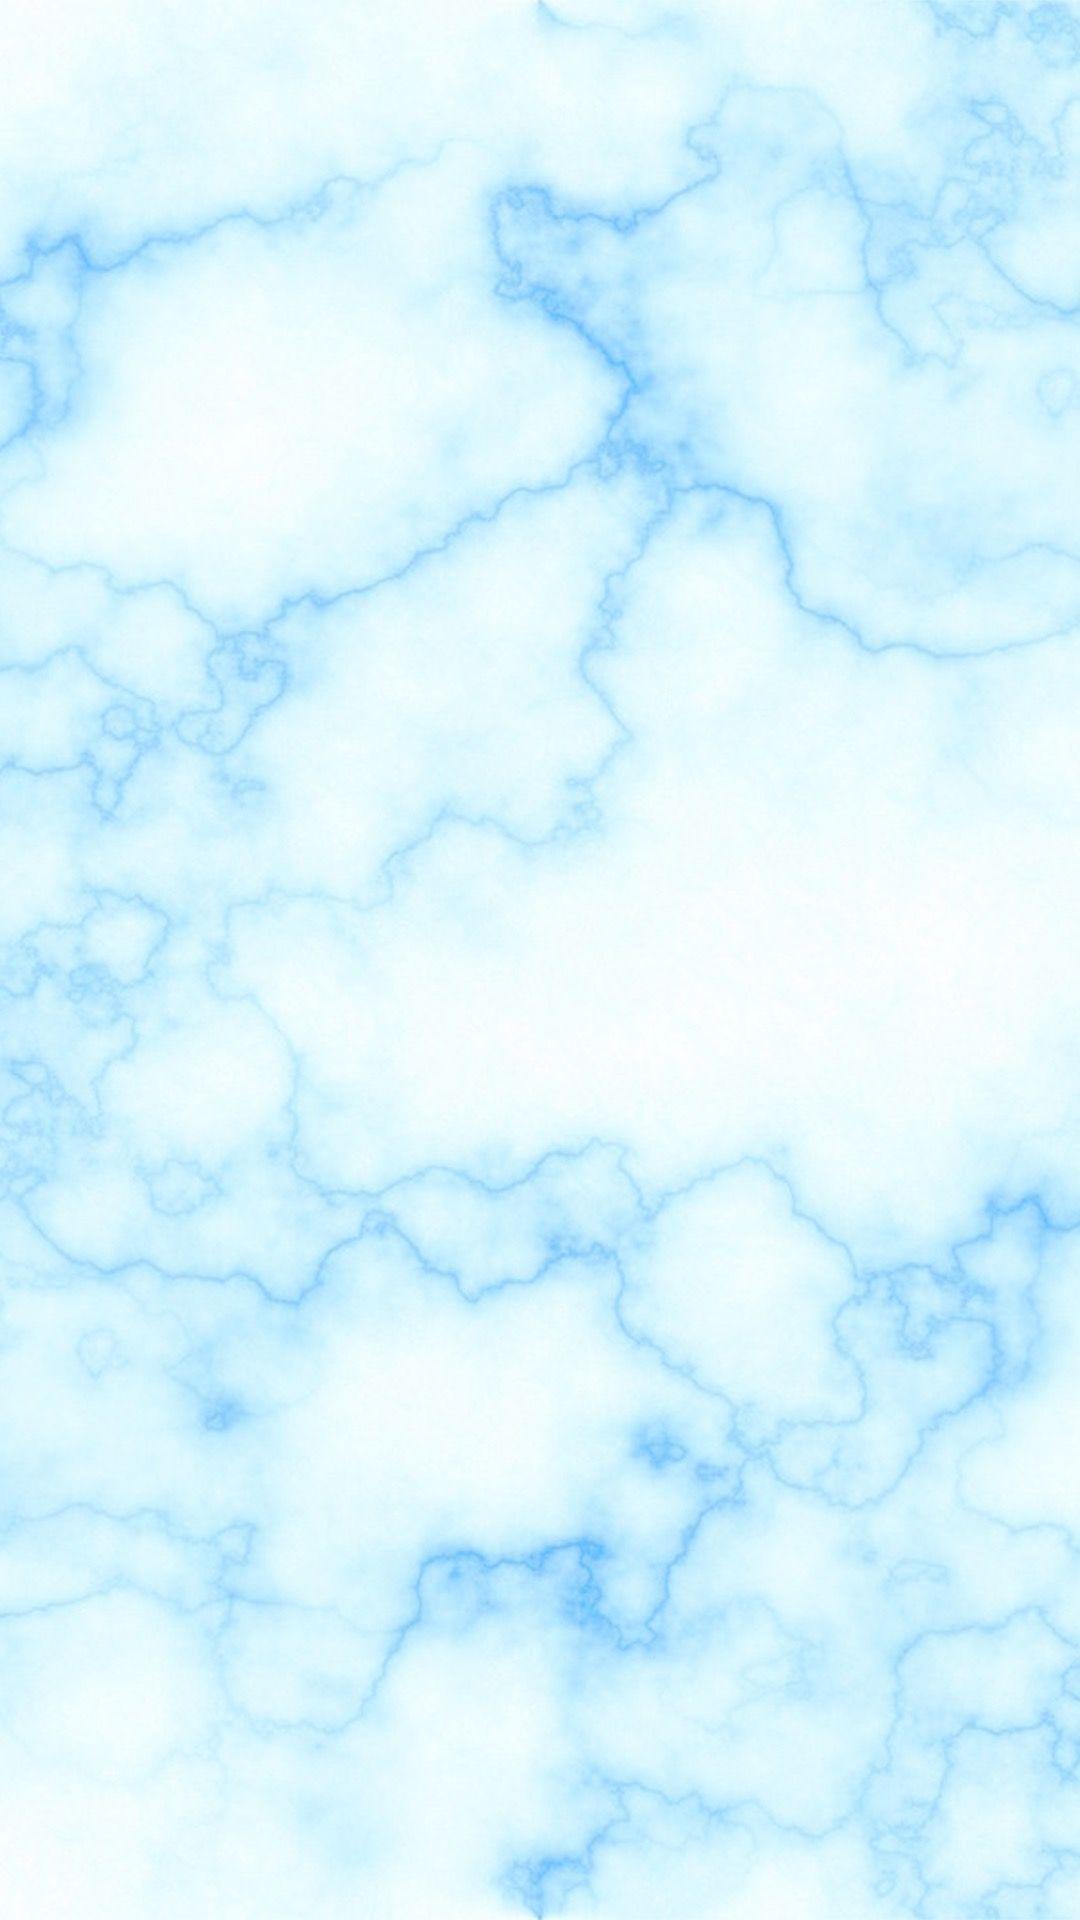 Blue Blueioswallpaper Bluewallpaperiphone Iphonewalls Blue Fullhdwallpaperiphone Get Gr In 2020 Blue Marble Wallpaper Cute Blue Wallpaper Blue Wallpaper Iphone